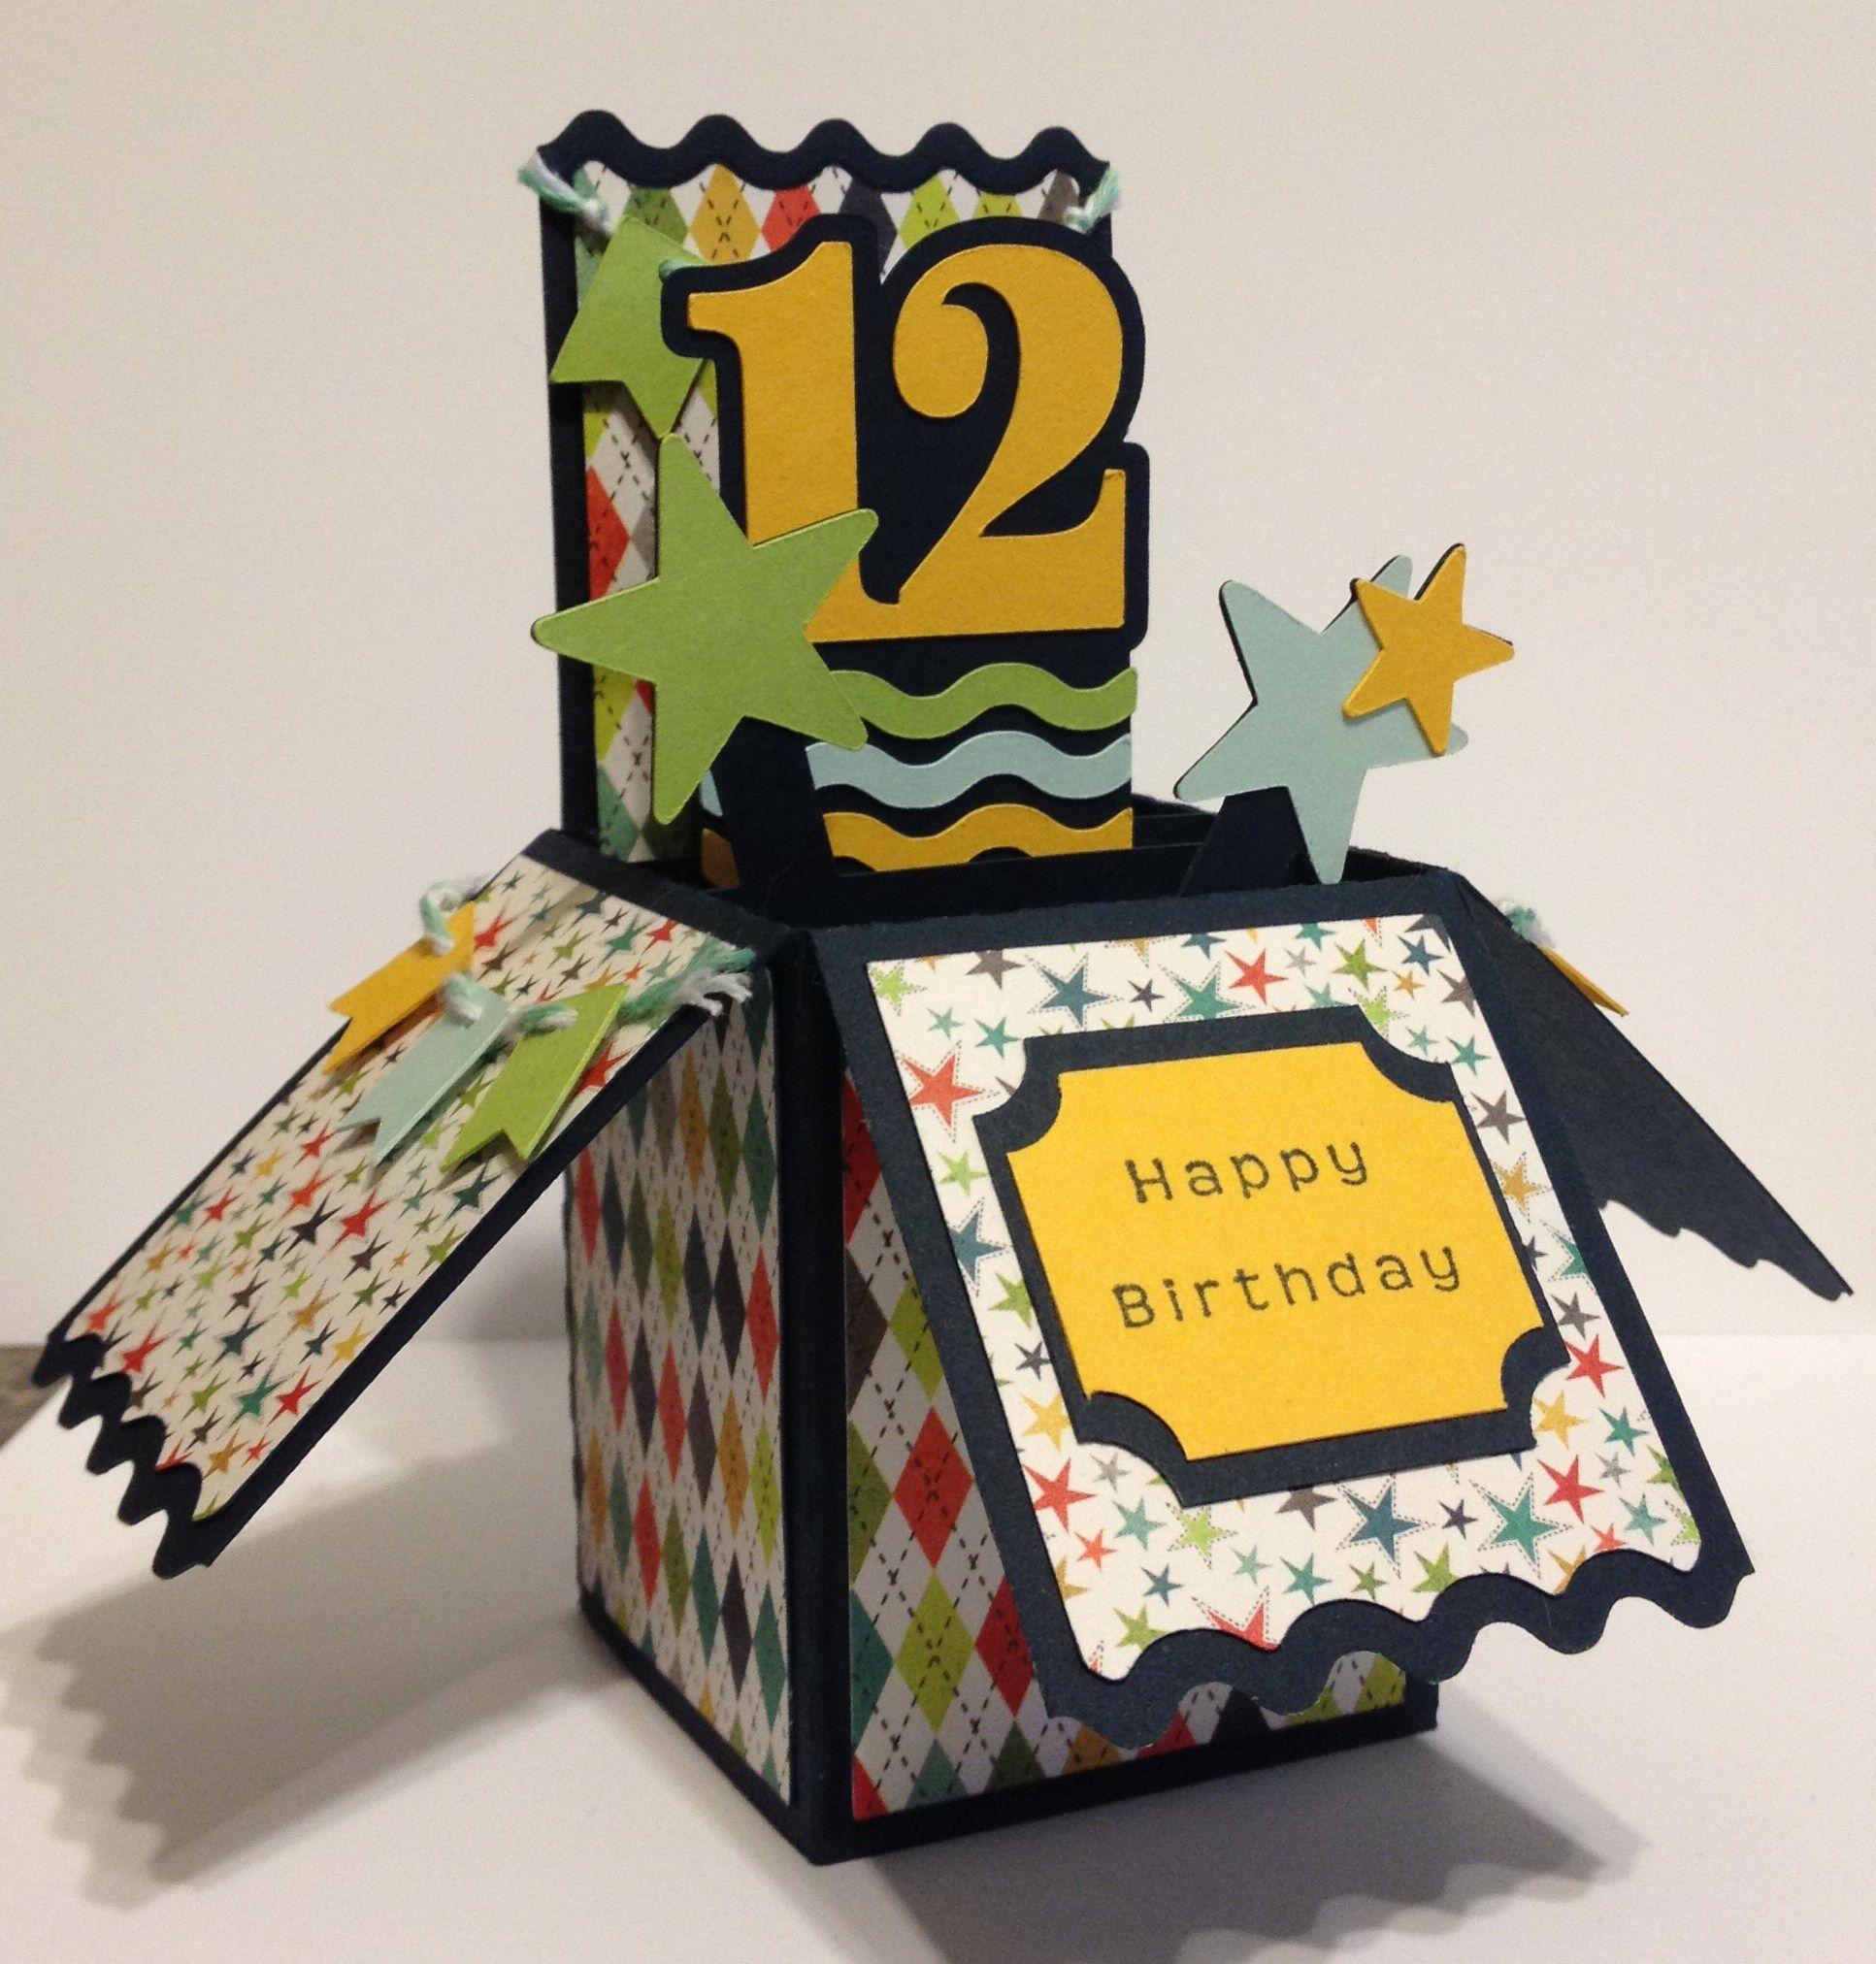 12th Birthday Box Card Silhouette Box Cards Pinterest 12th